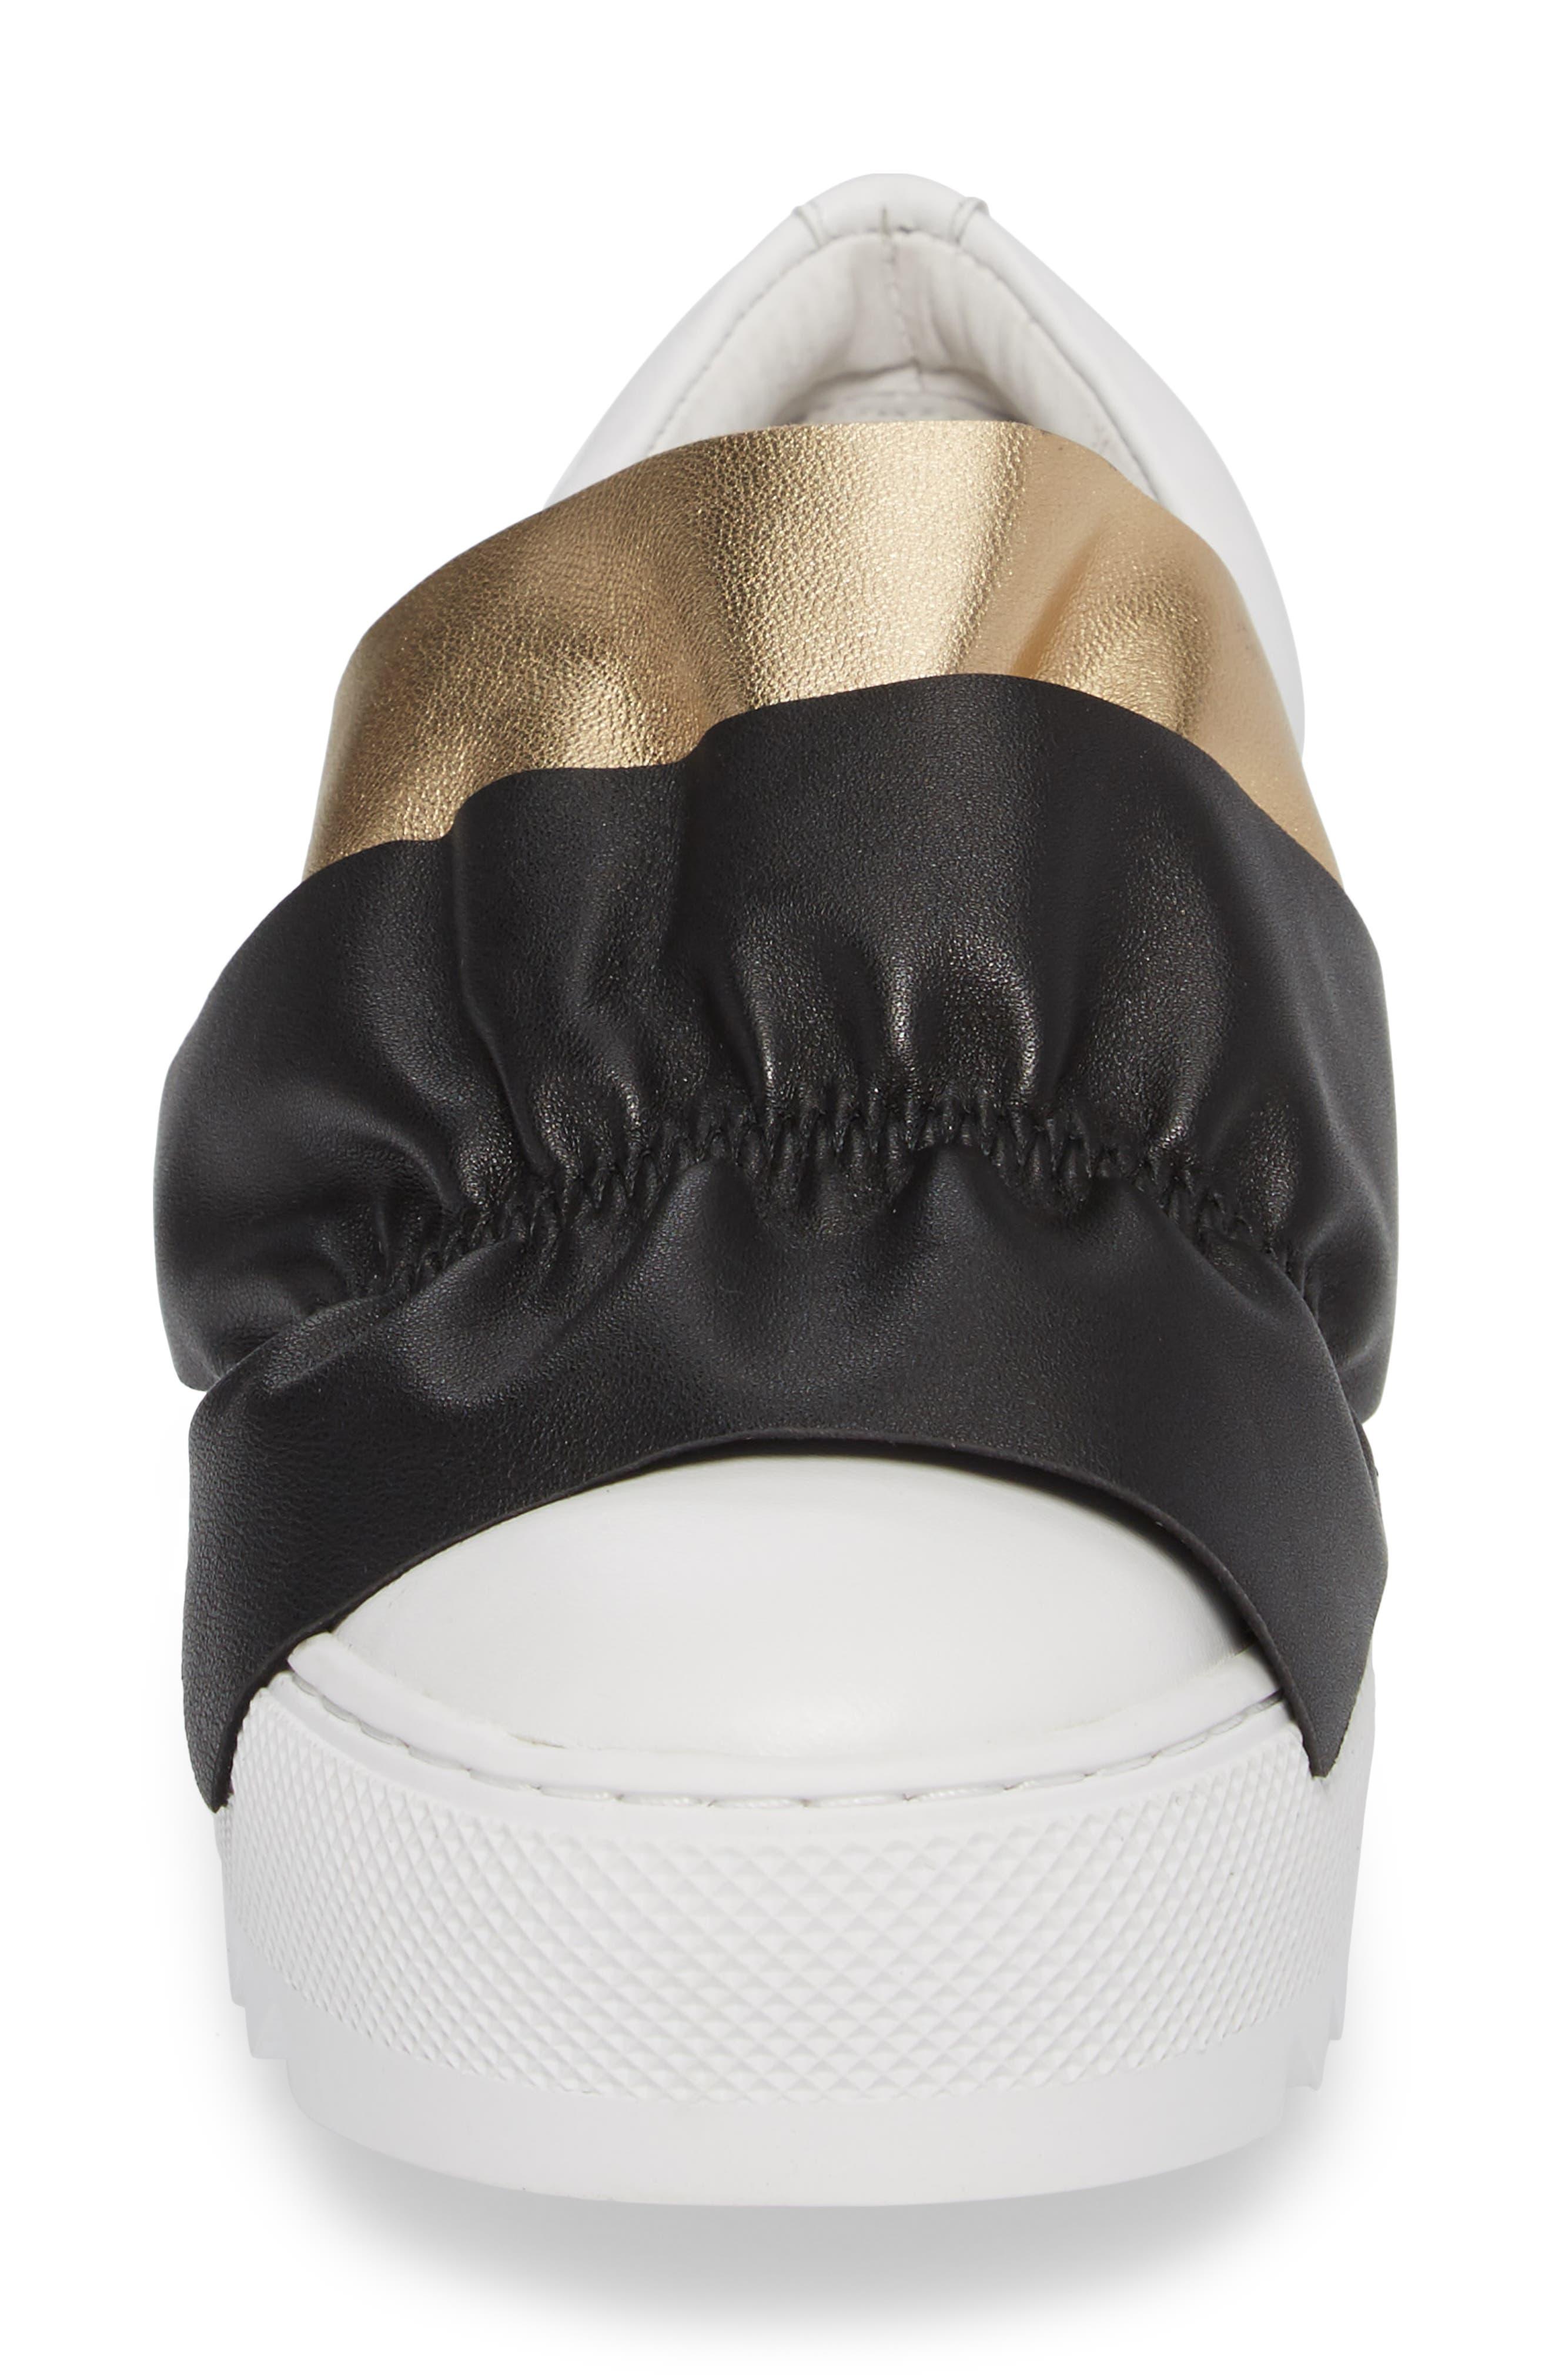 Sadie Ruffle Platform Sneaker,                             Alternate thumbnail 4, color,                             WHITE LEATHER